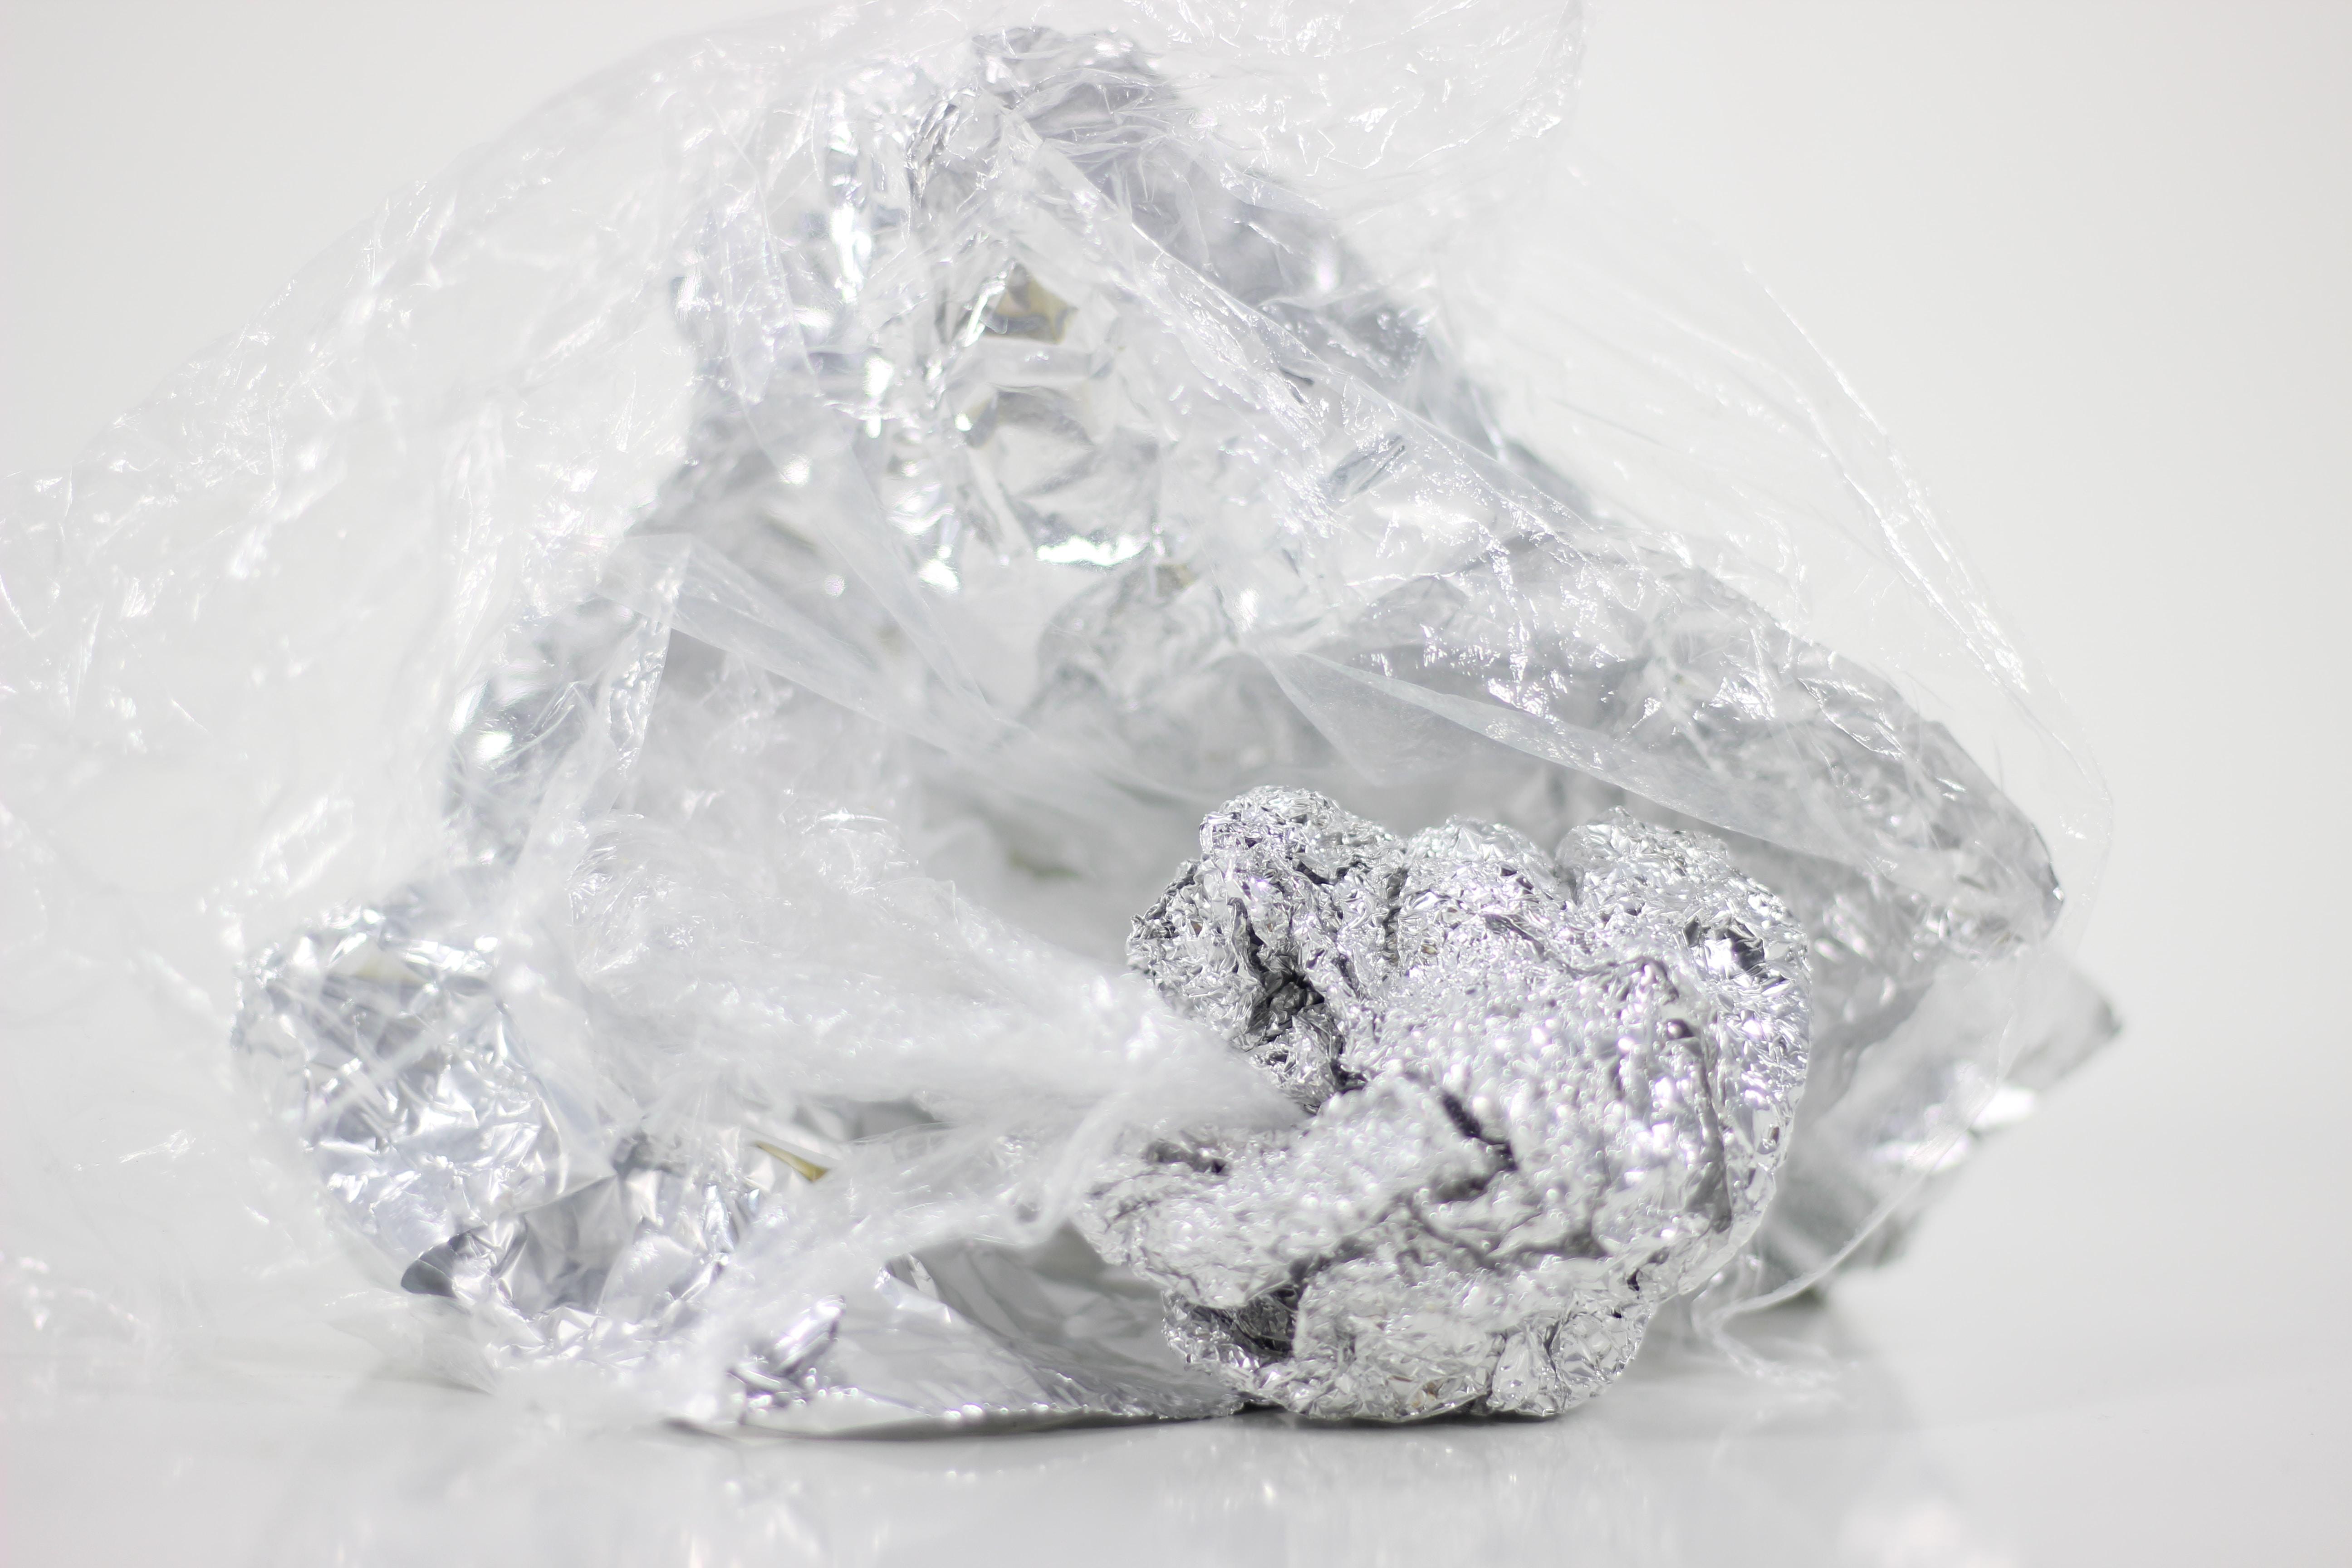 white and black stone fragment